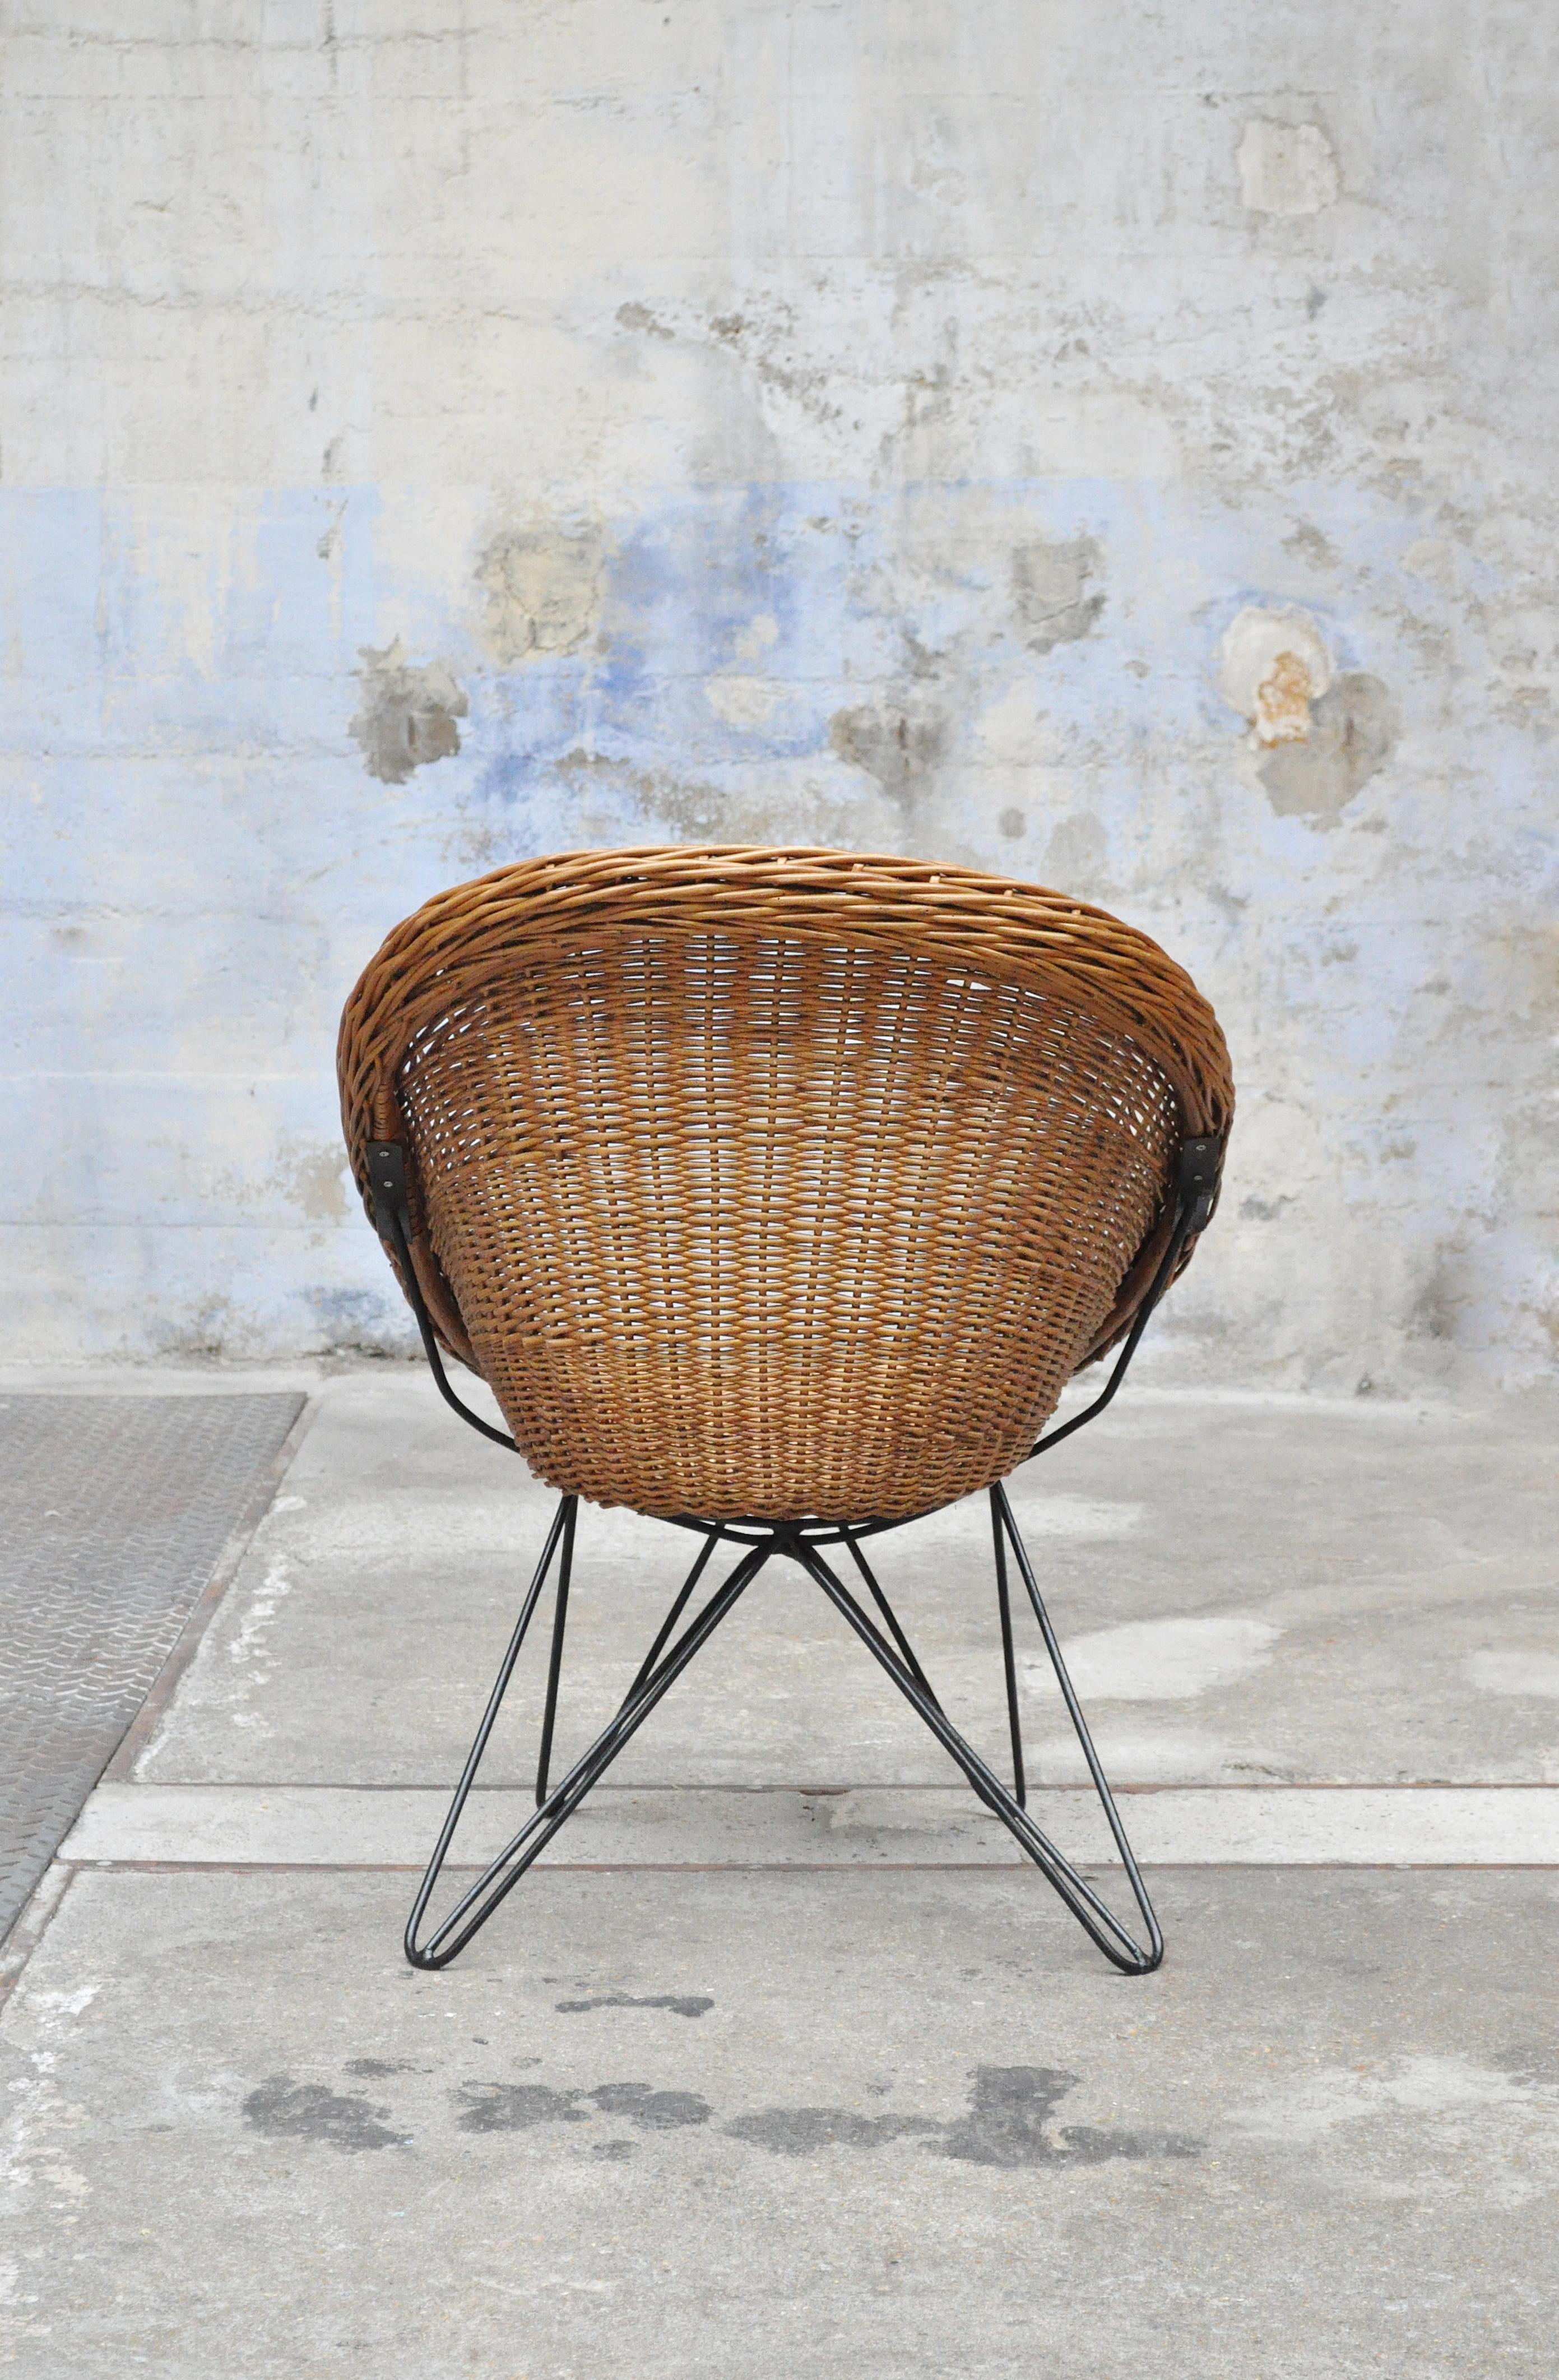 fauteuil rotin vintage - Fauteuil Rotin Vintage